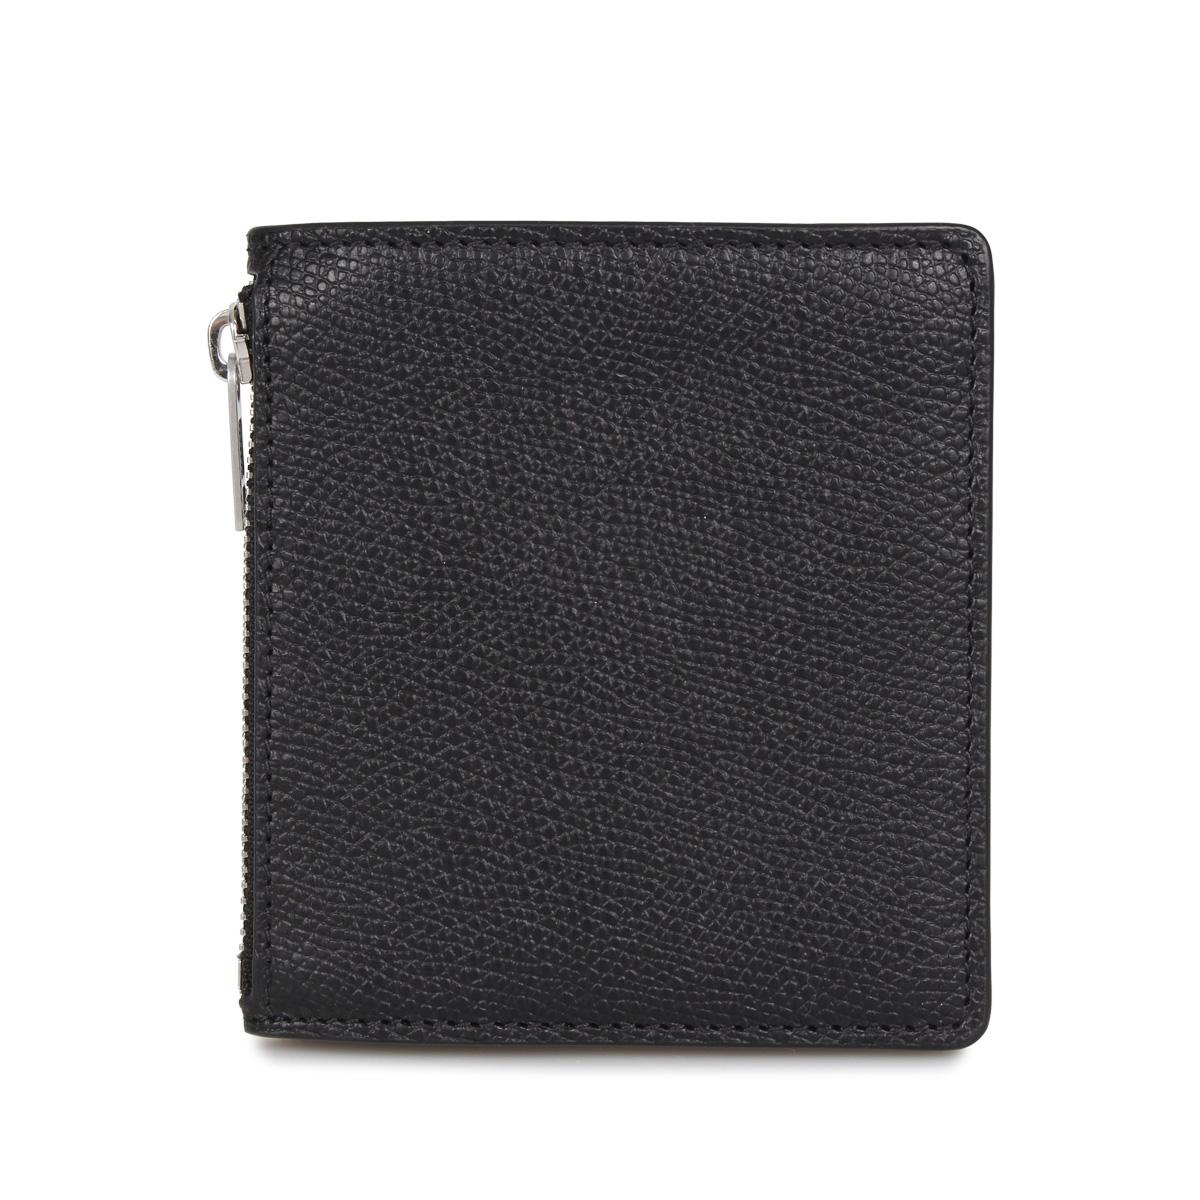 MAISON MARGIELA WALLET メゾンマルジェラ 財布 二つ折り メンズ レディース ブラック 黒 S35UI0448-T8013 [3/4 新入荷]